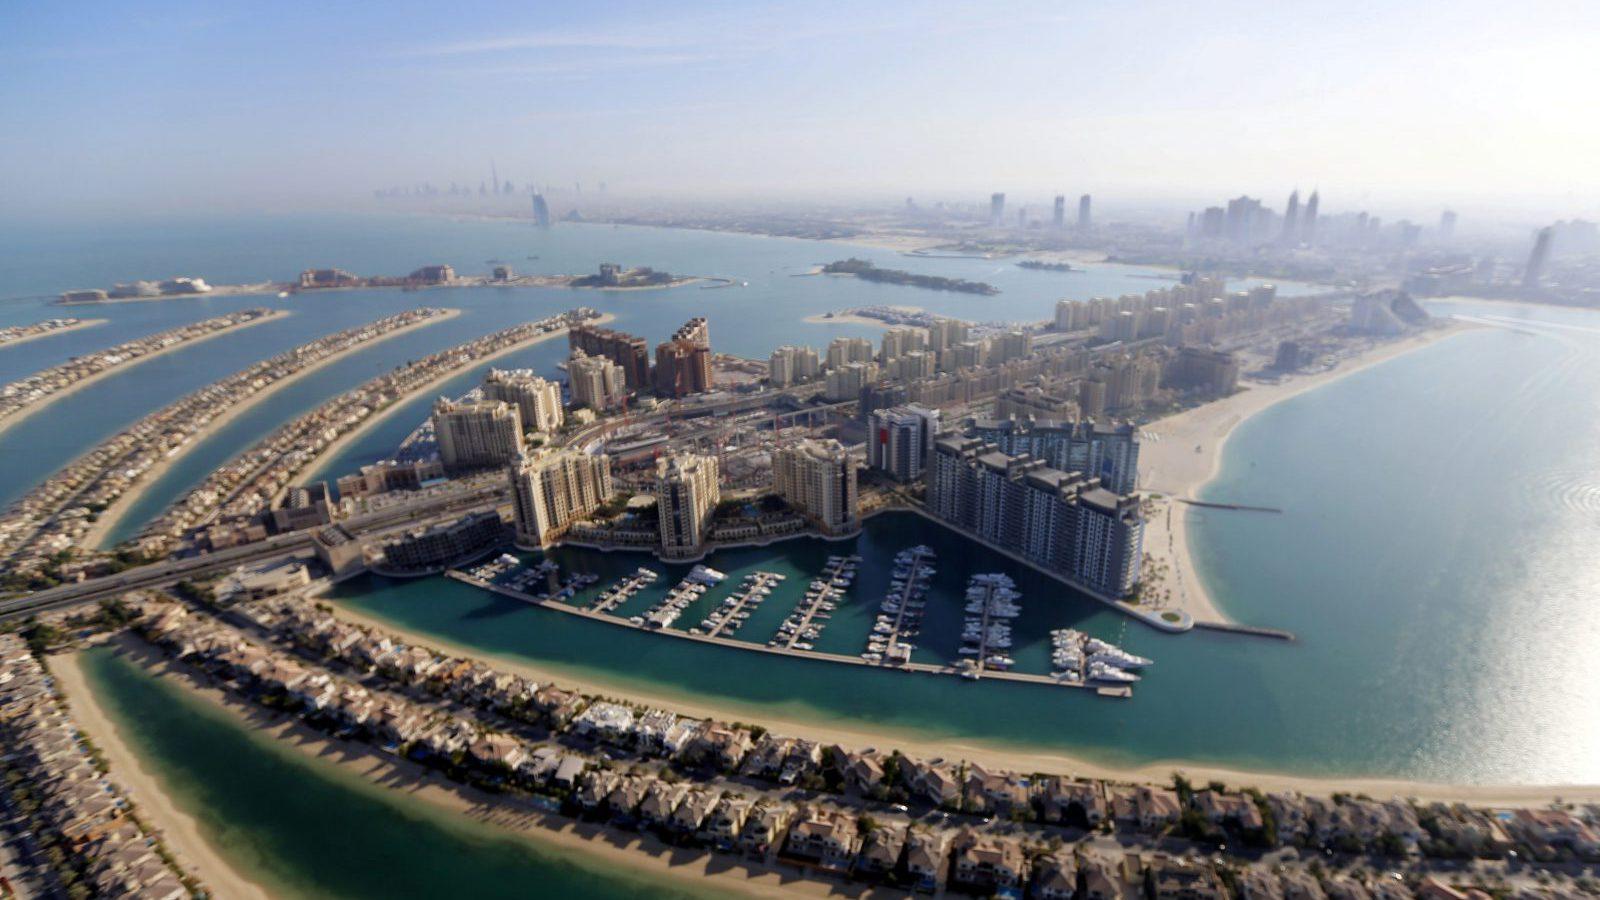 A general view of the Jumeirah neighbourhood in Dubai, UAE December 9, 2015. Picture taken December 9, 2015.